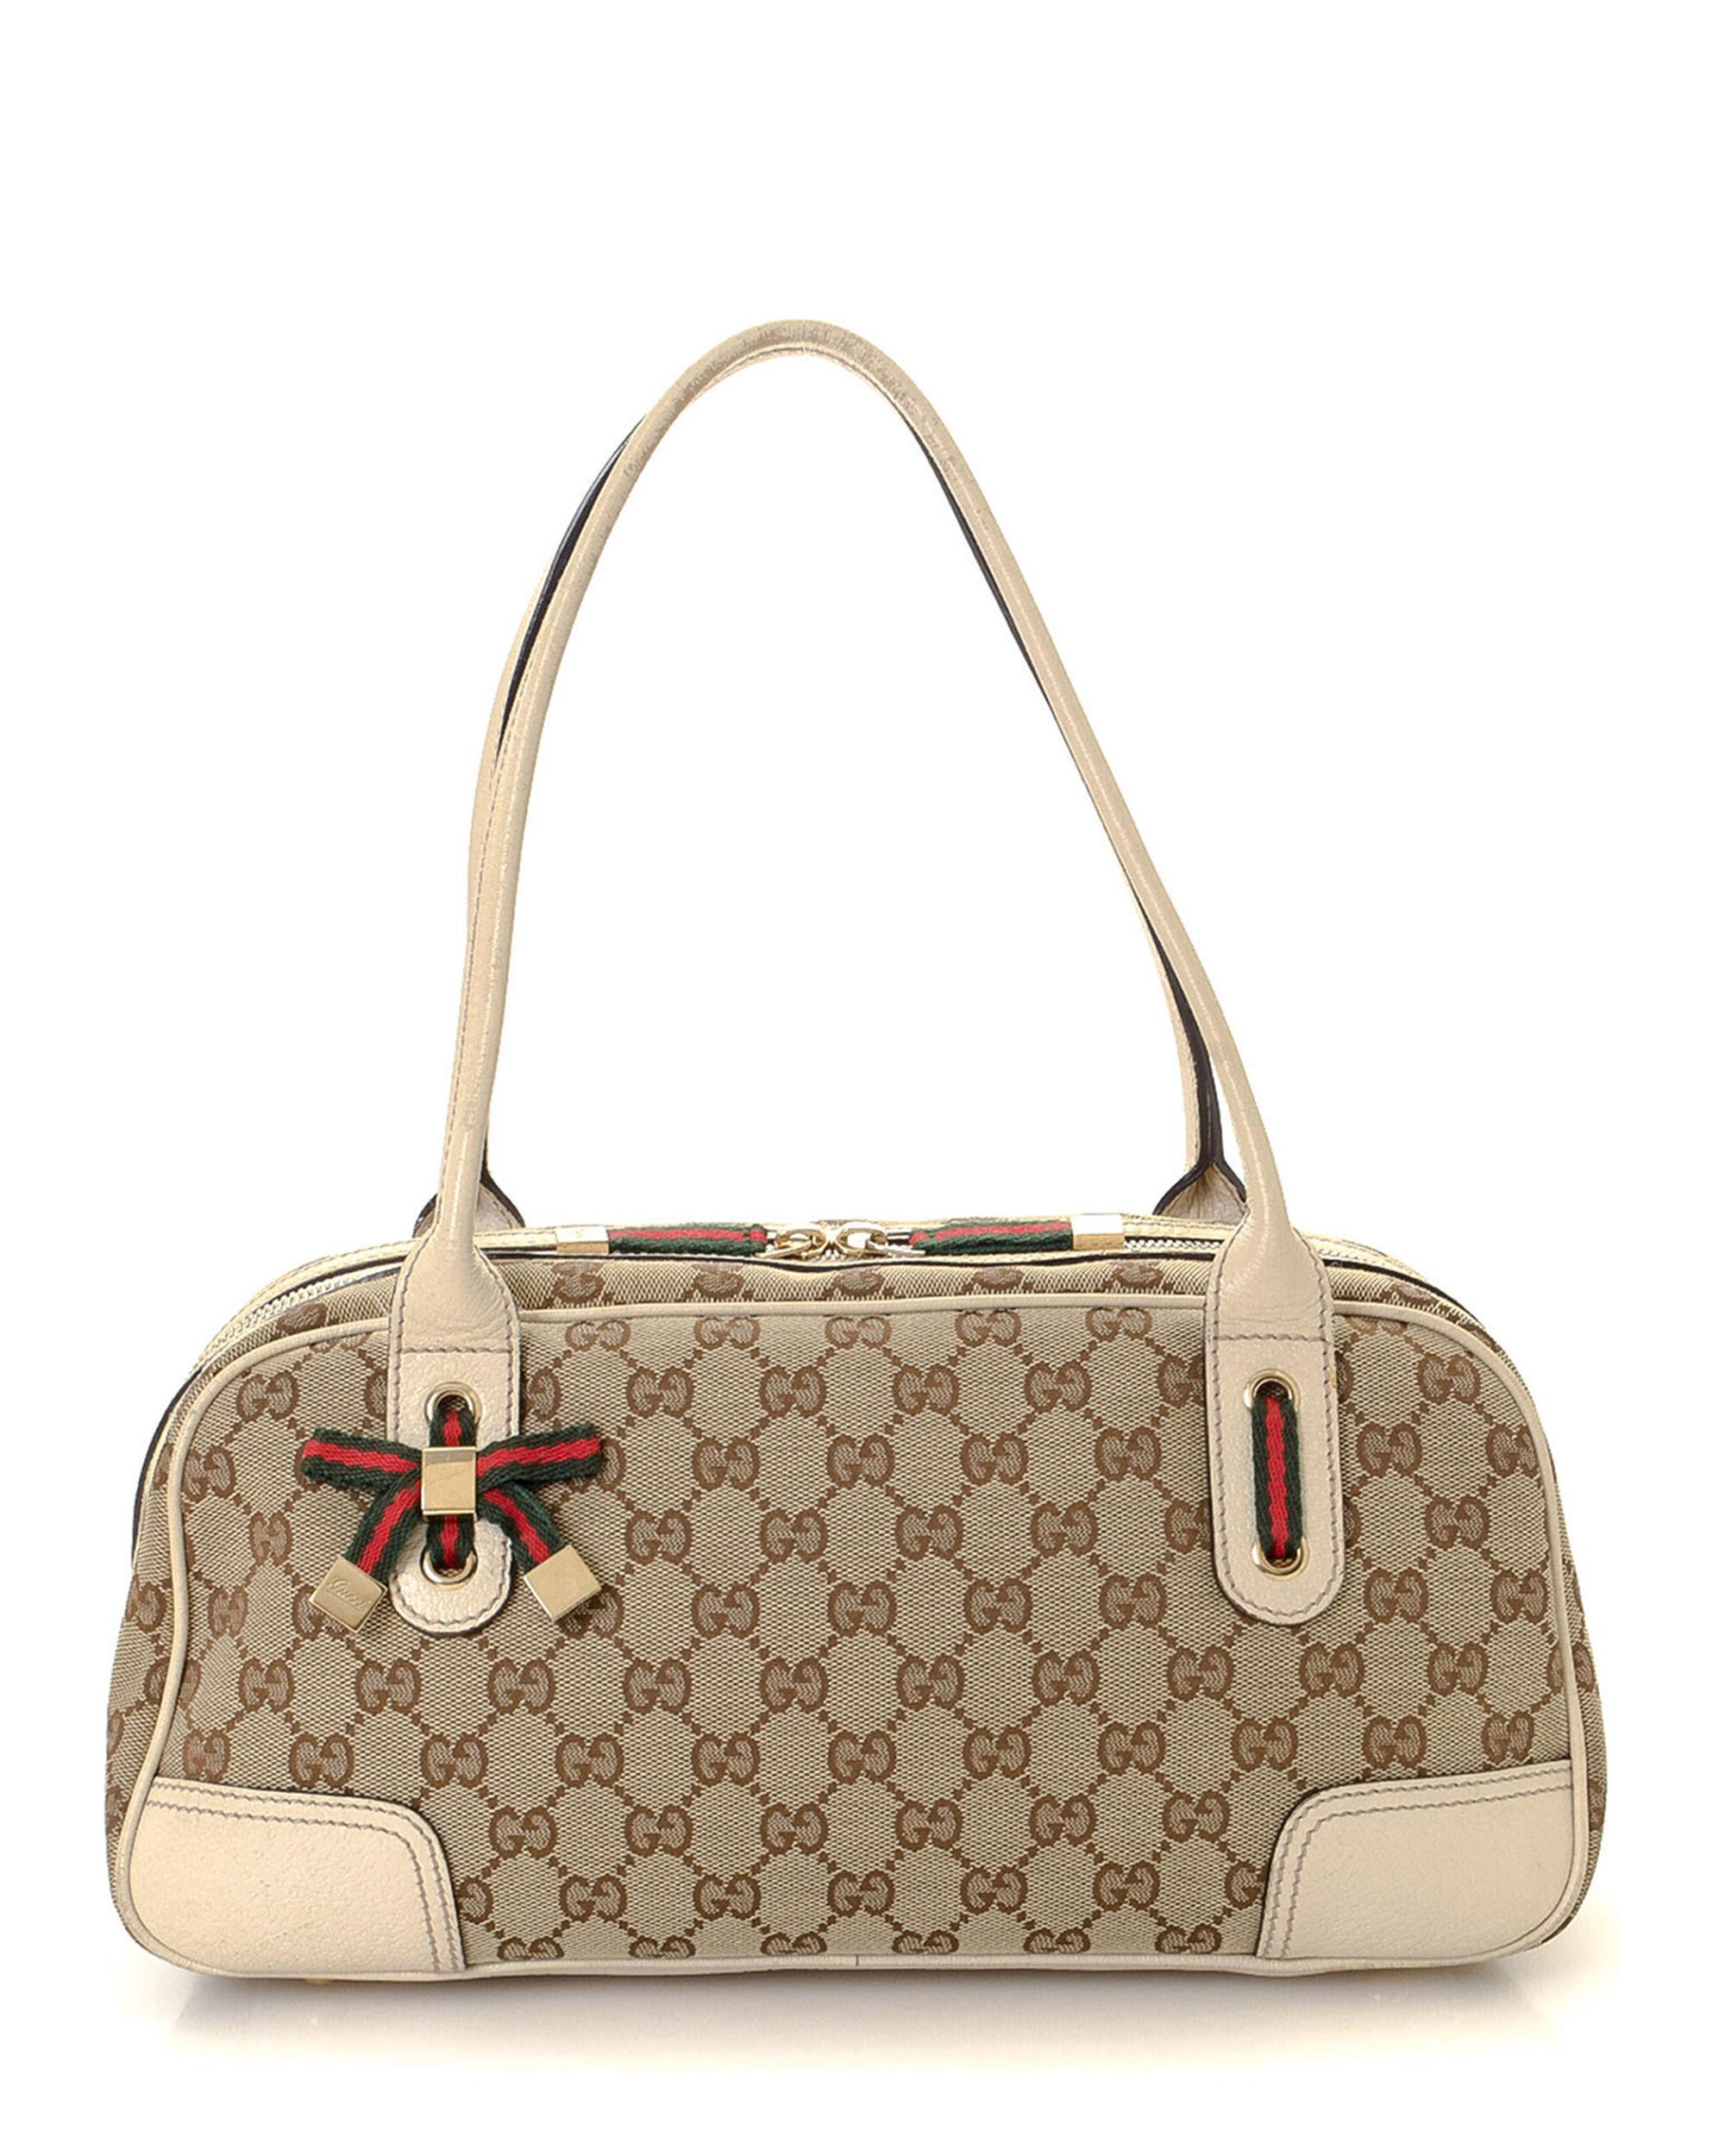 4a18fabf29b Lyst - Gucci GG Canvas Princy Shoulder Bag - Vintage in Natural